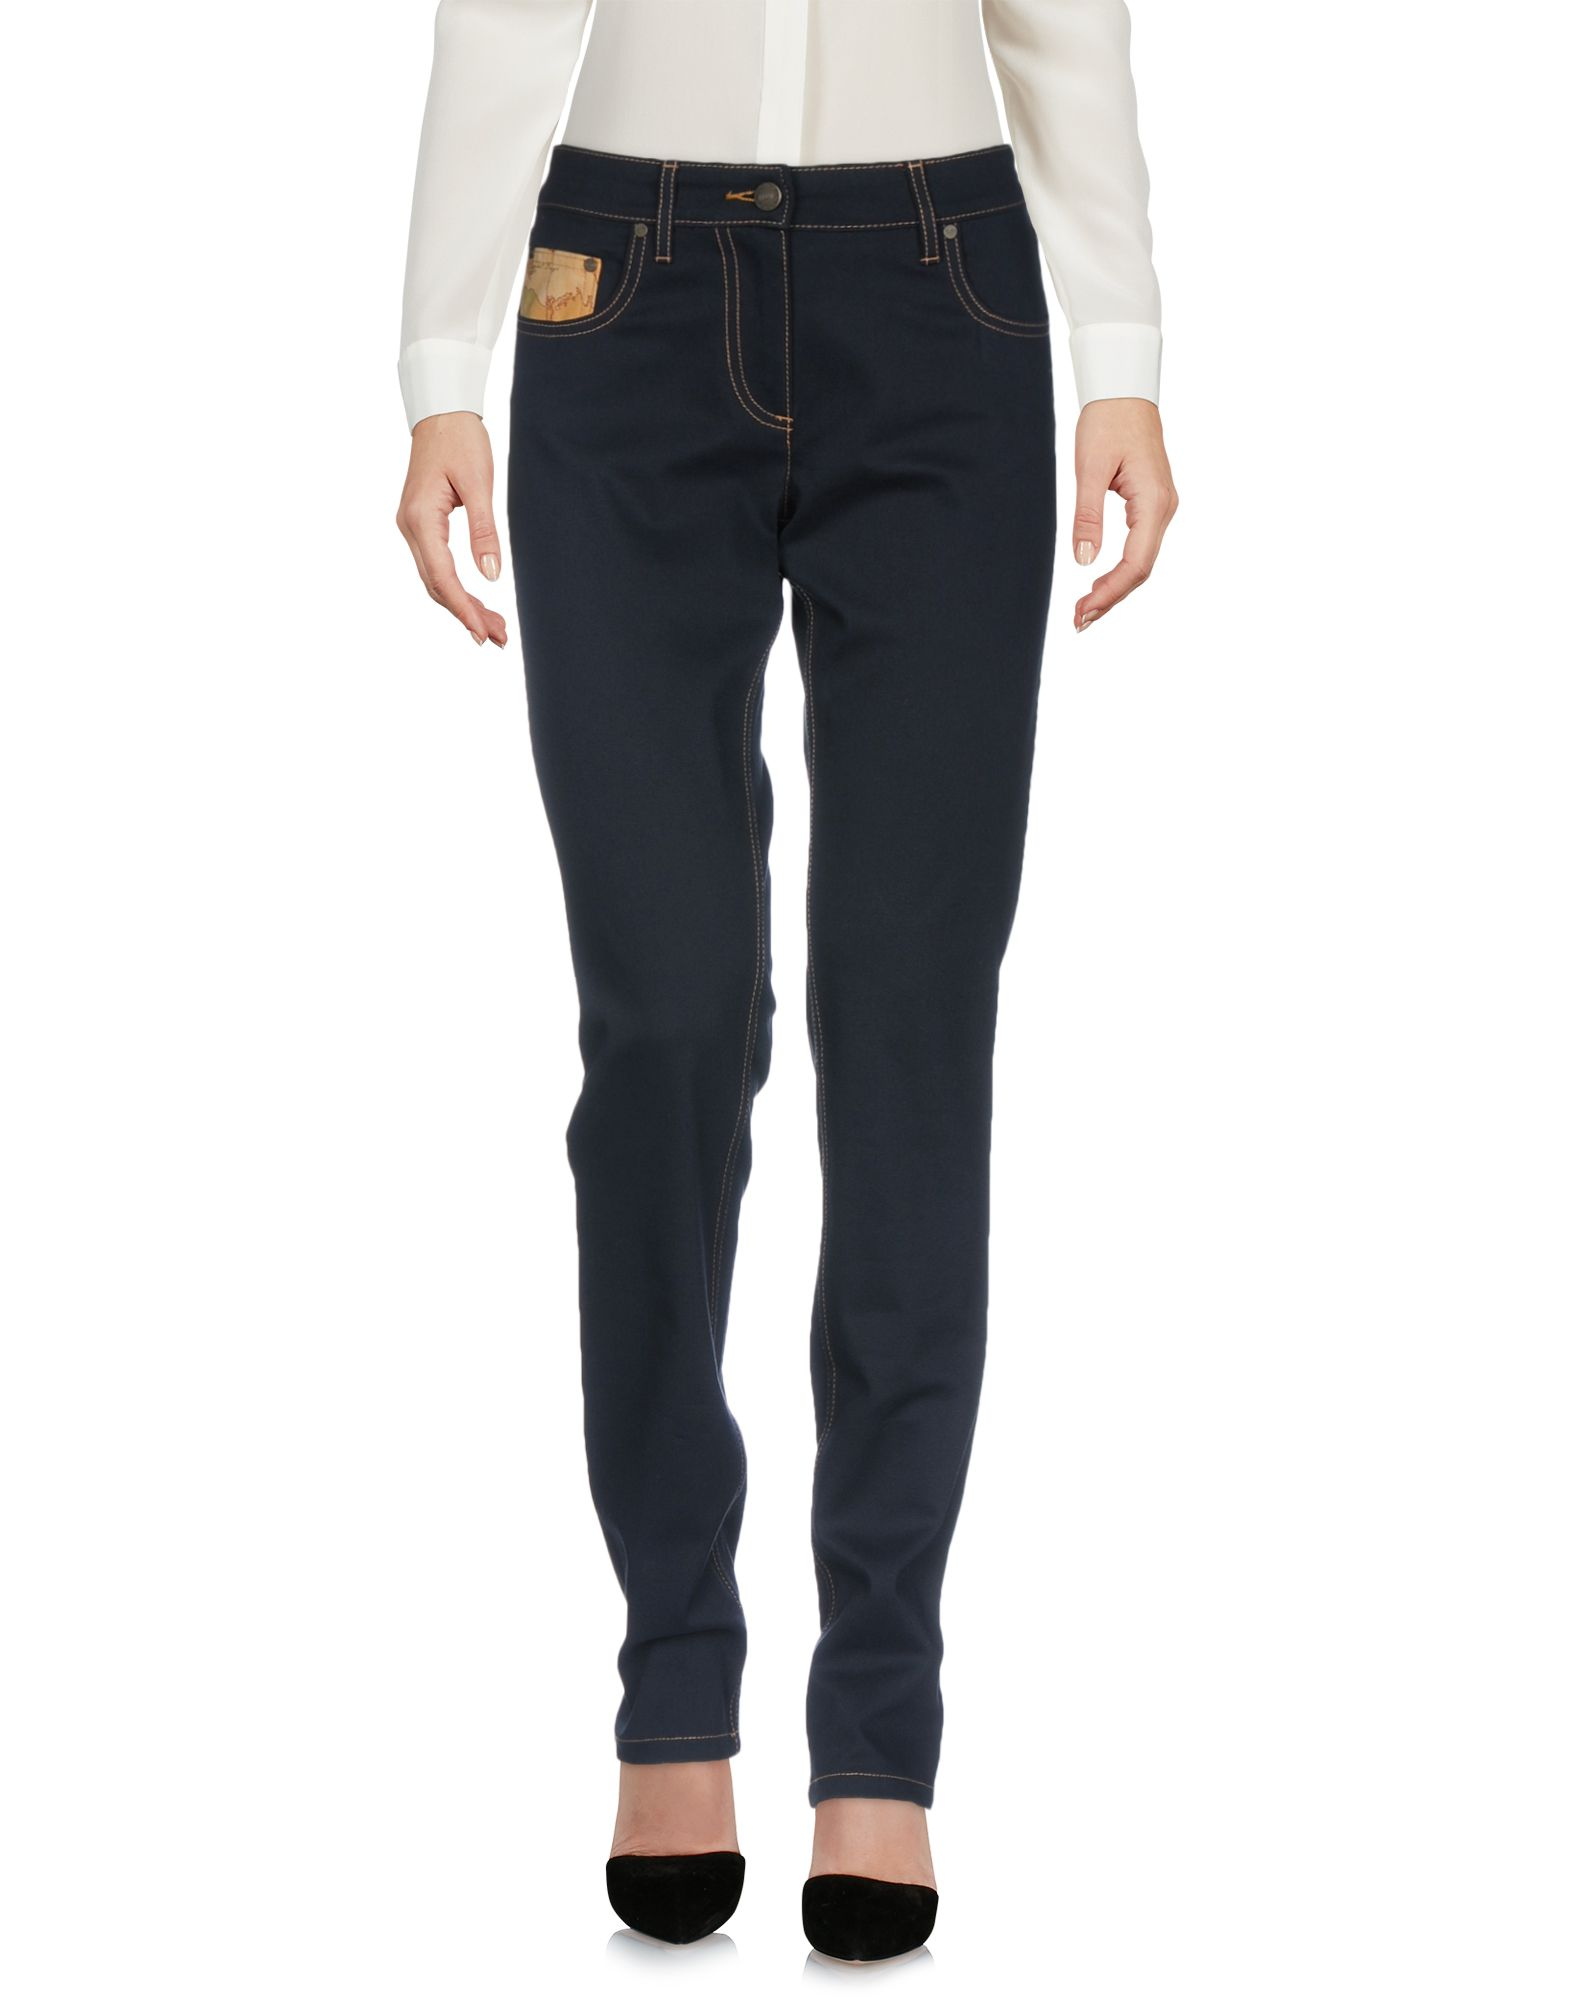 DONNAVVENTURA by ALVIERO MARTINI 1a CLASSE Повседневные брюки цена 2017